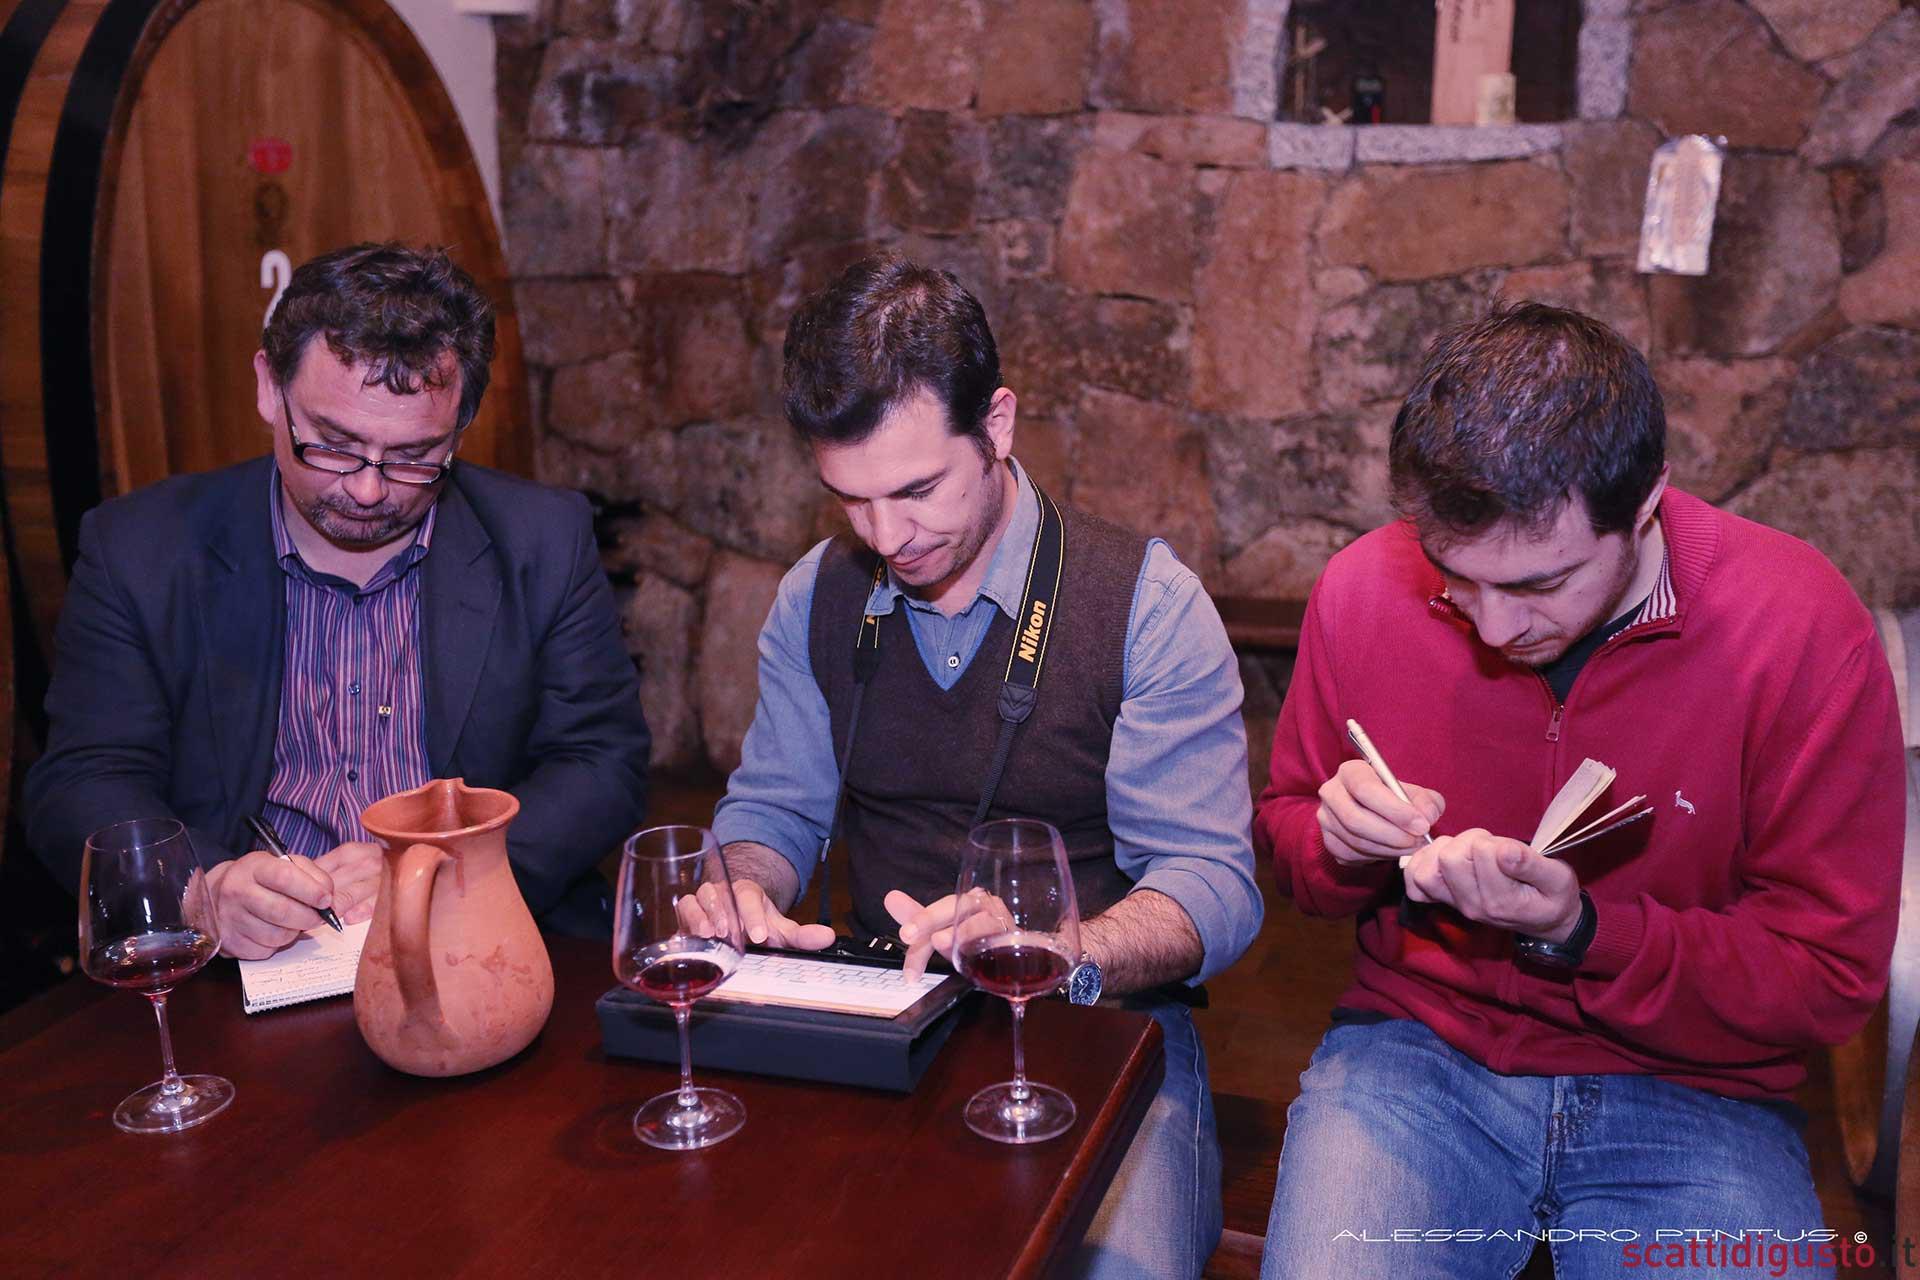 assaggi-vini-Montisci-Cannonau-appunti